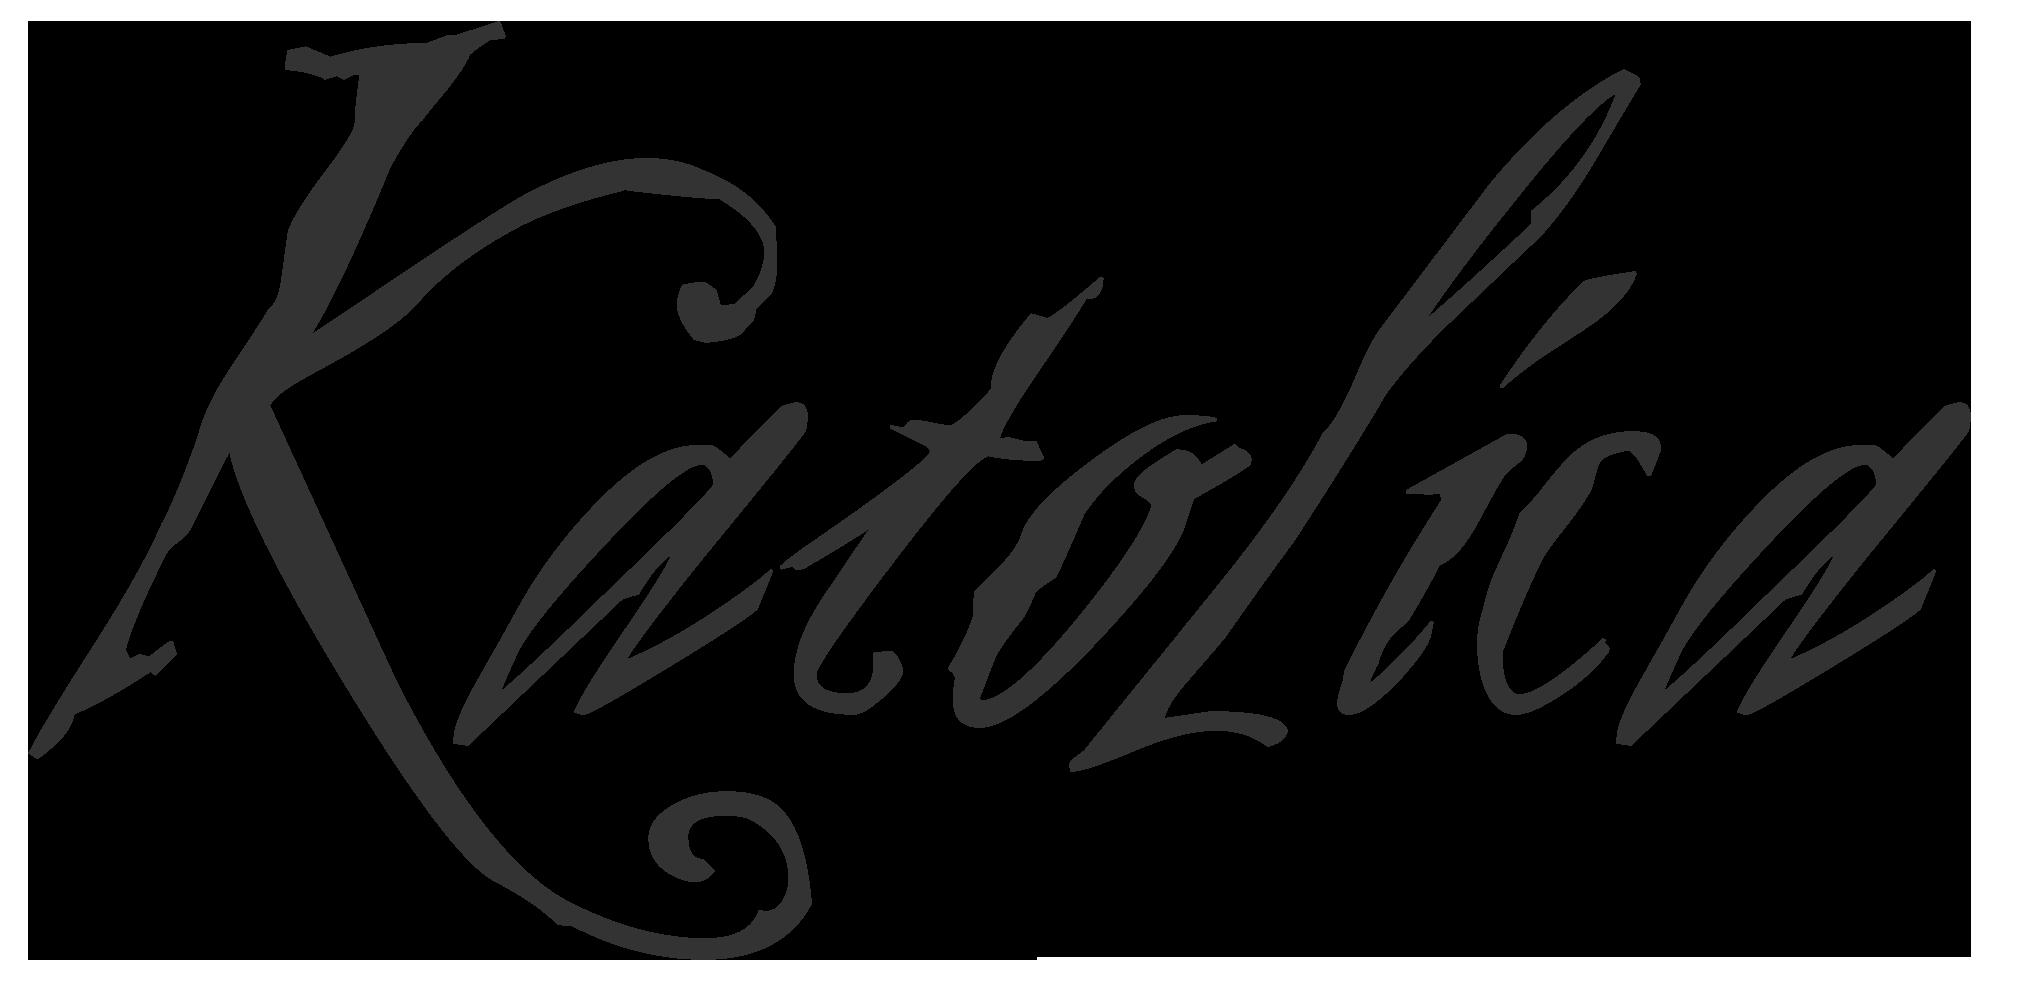 Katolica-logo